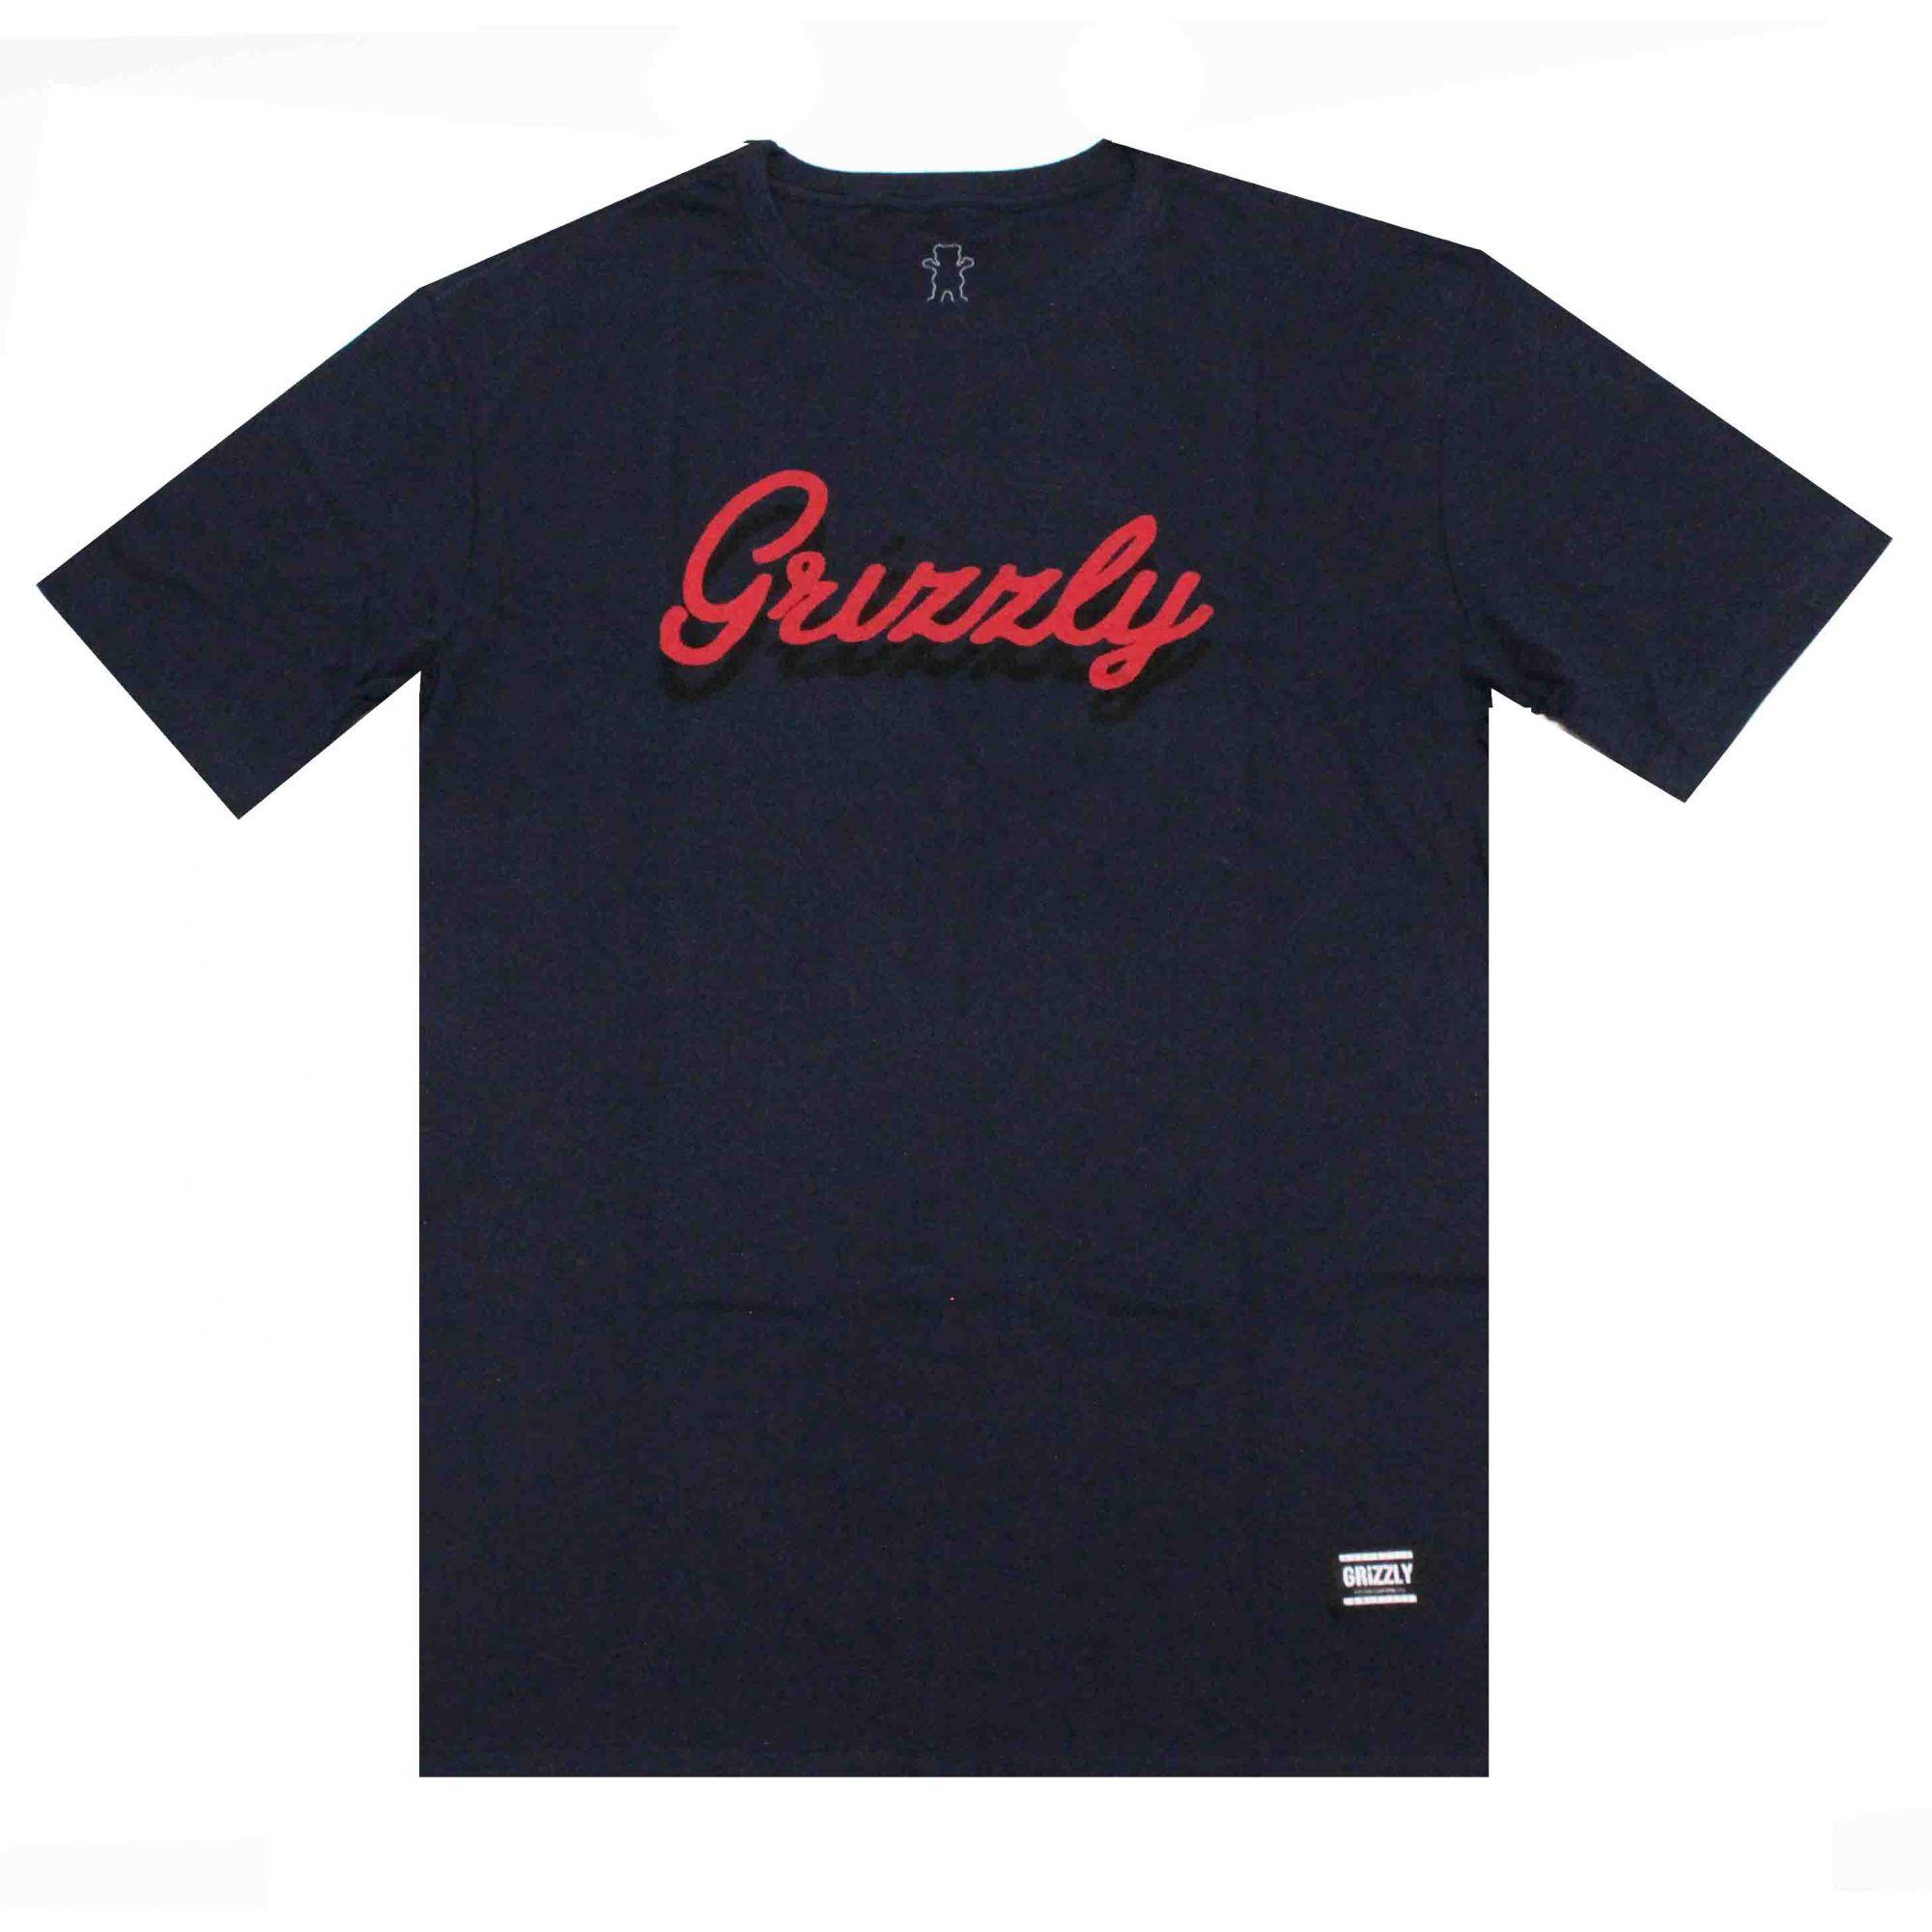 Camiseta Grizzly Cursive Blue Navy